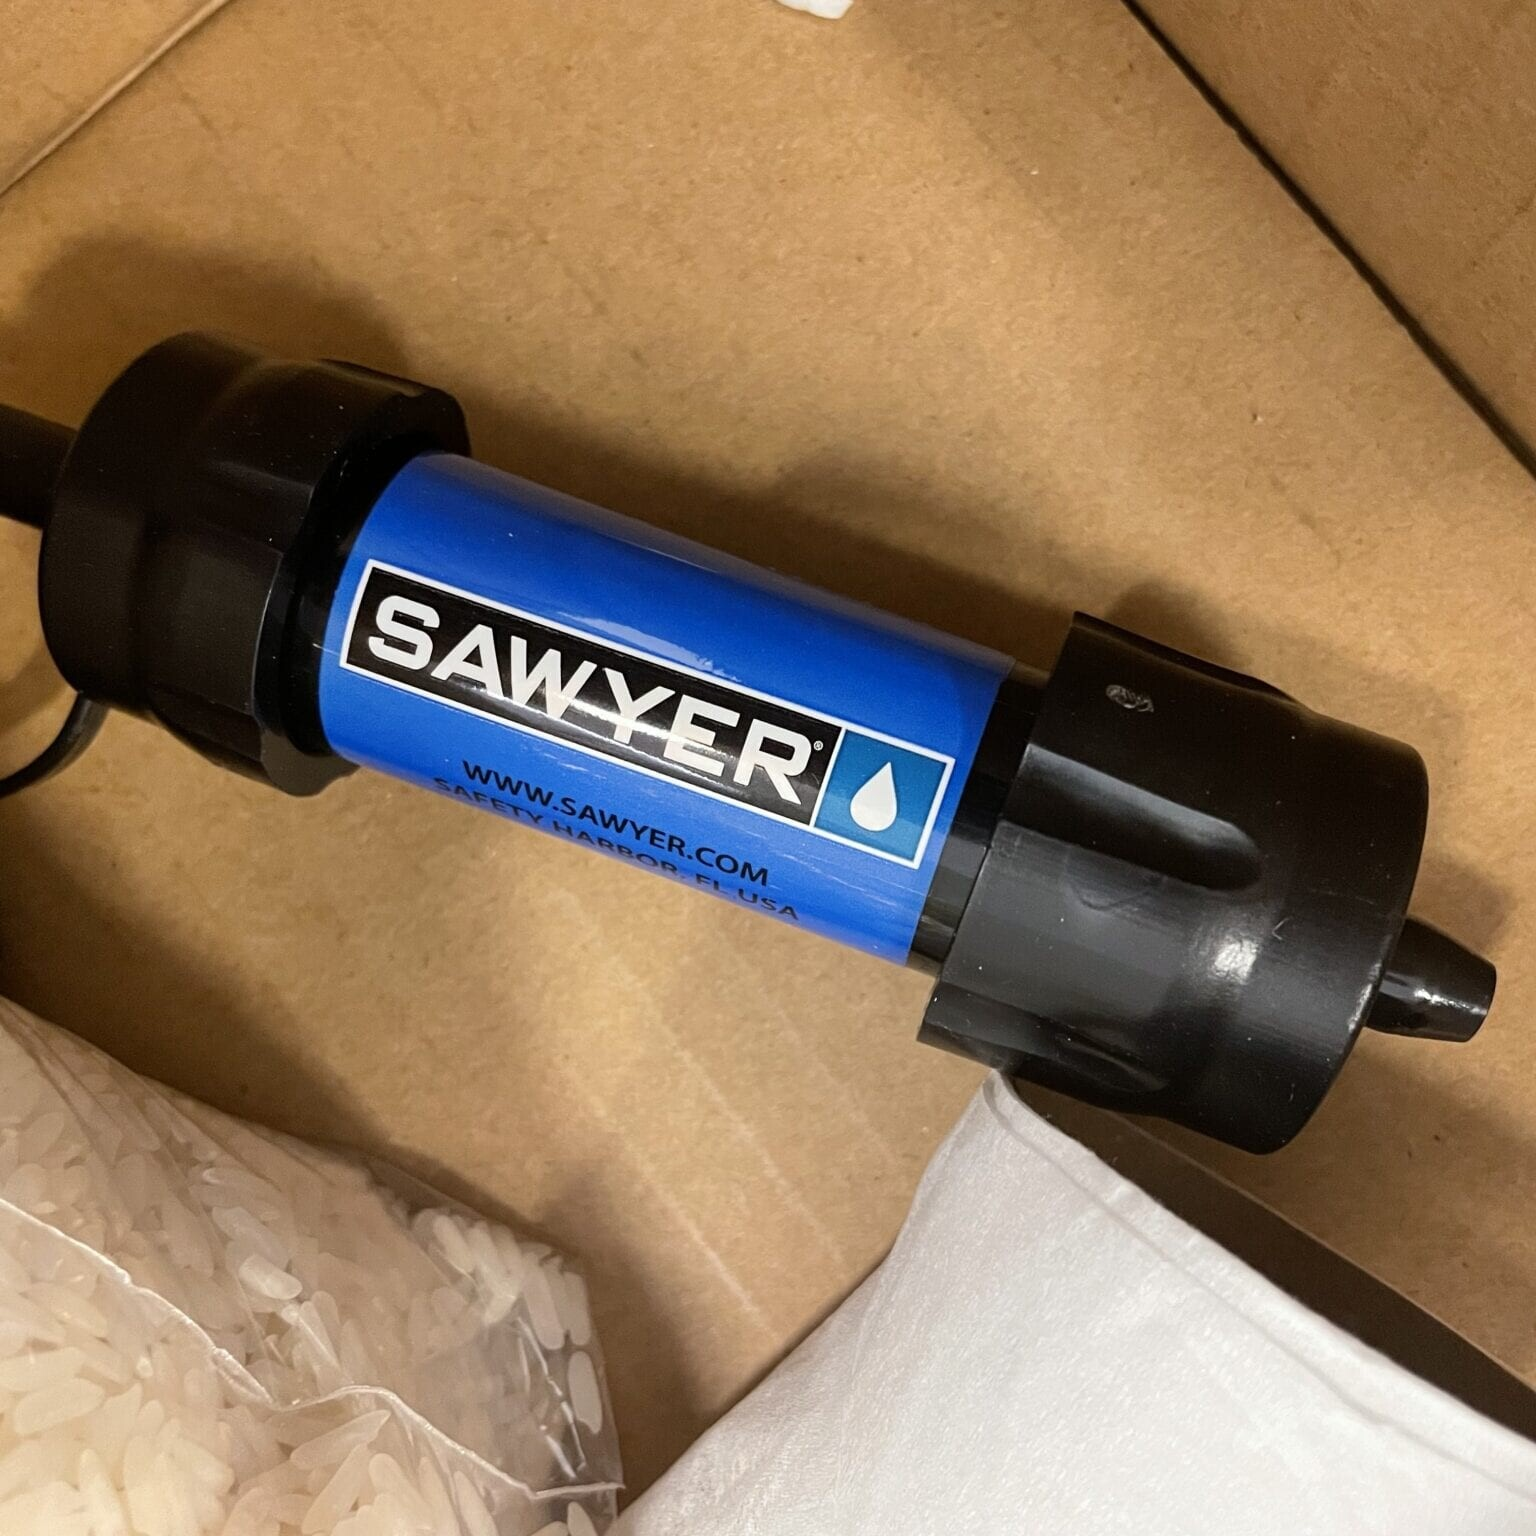 Sawyer water filter